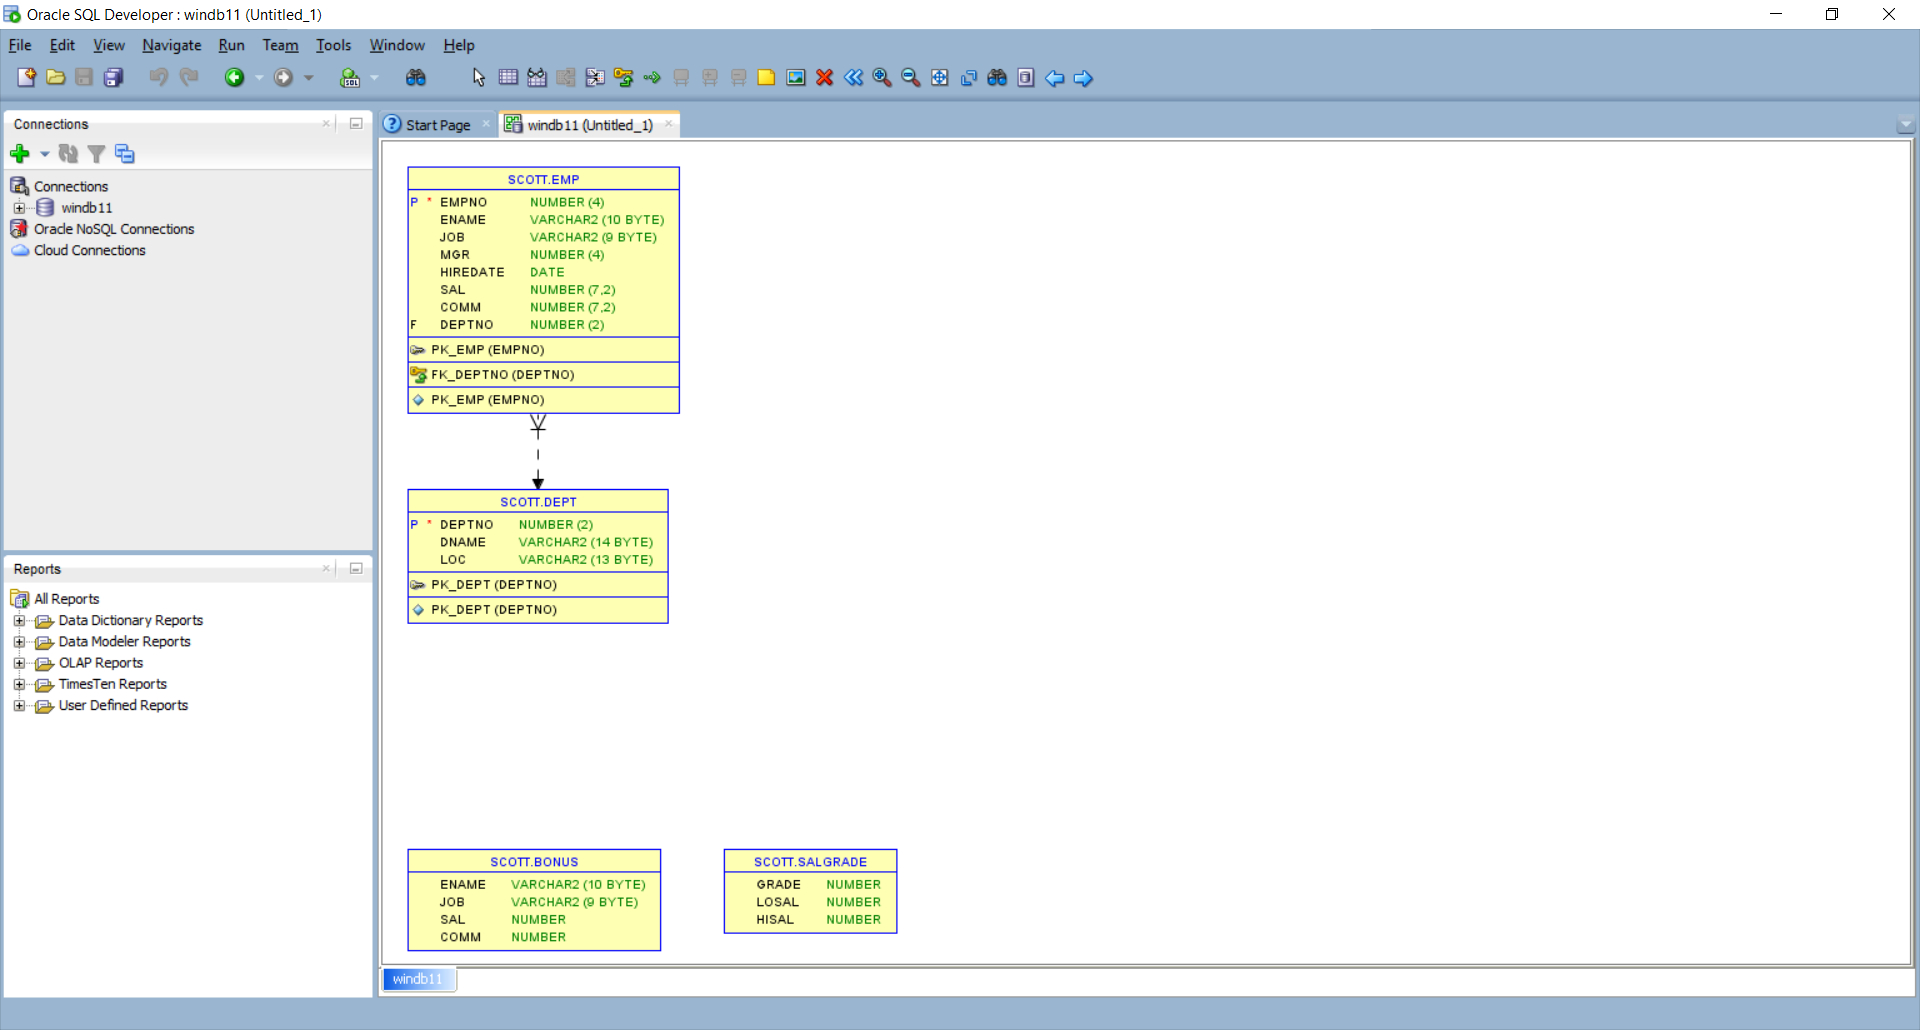 Database Diagram Using Sql Developer - Blog Dbi Services pertaining to Er Diagram In Sql Developer 4.1